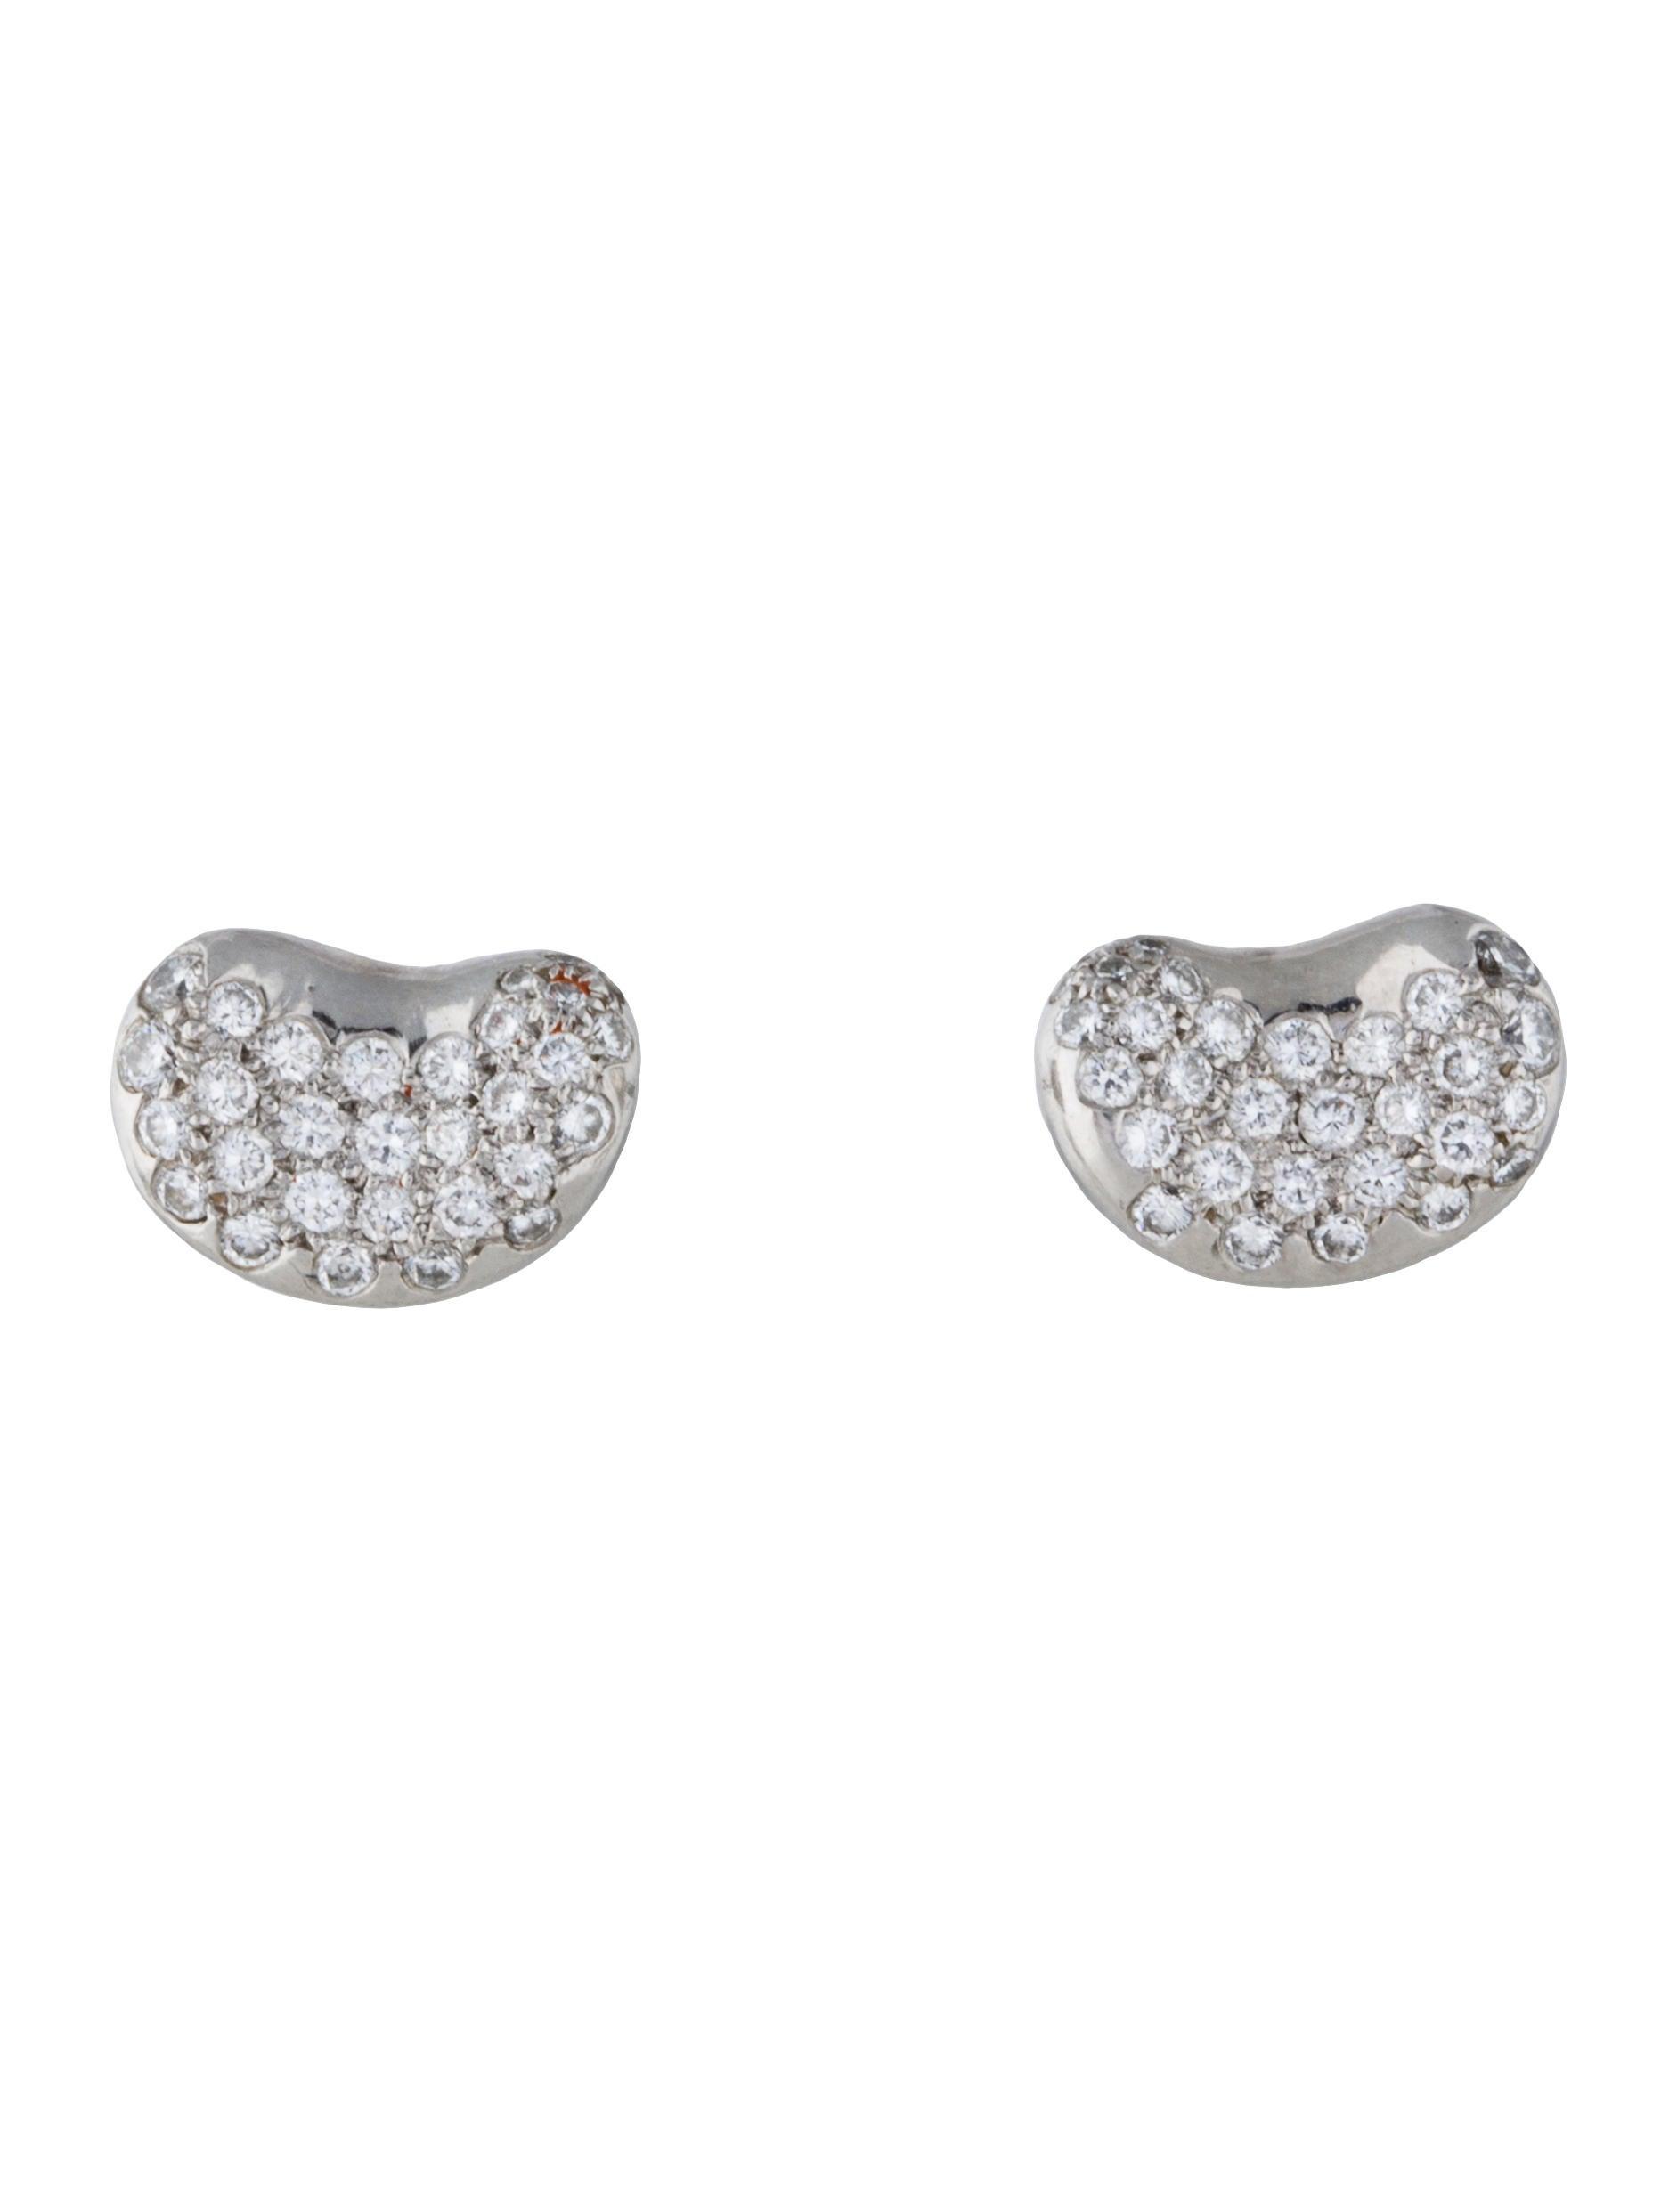 Platinum Diamond Bean Earrings